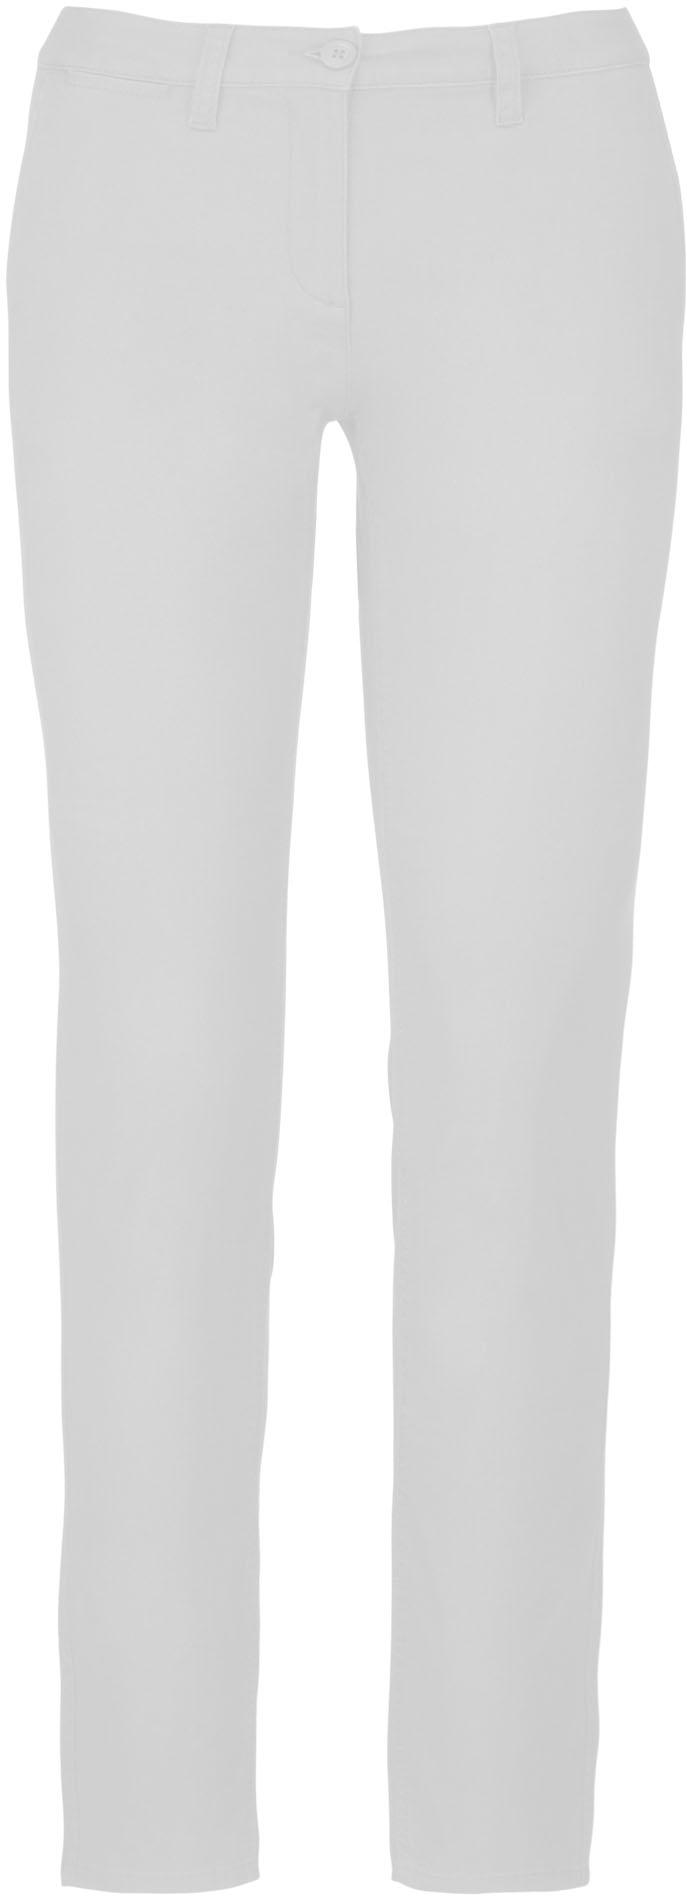 Pantalon chino femme - 2-1479-8